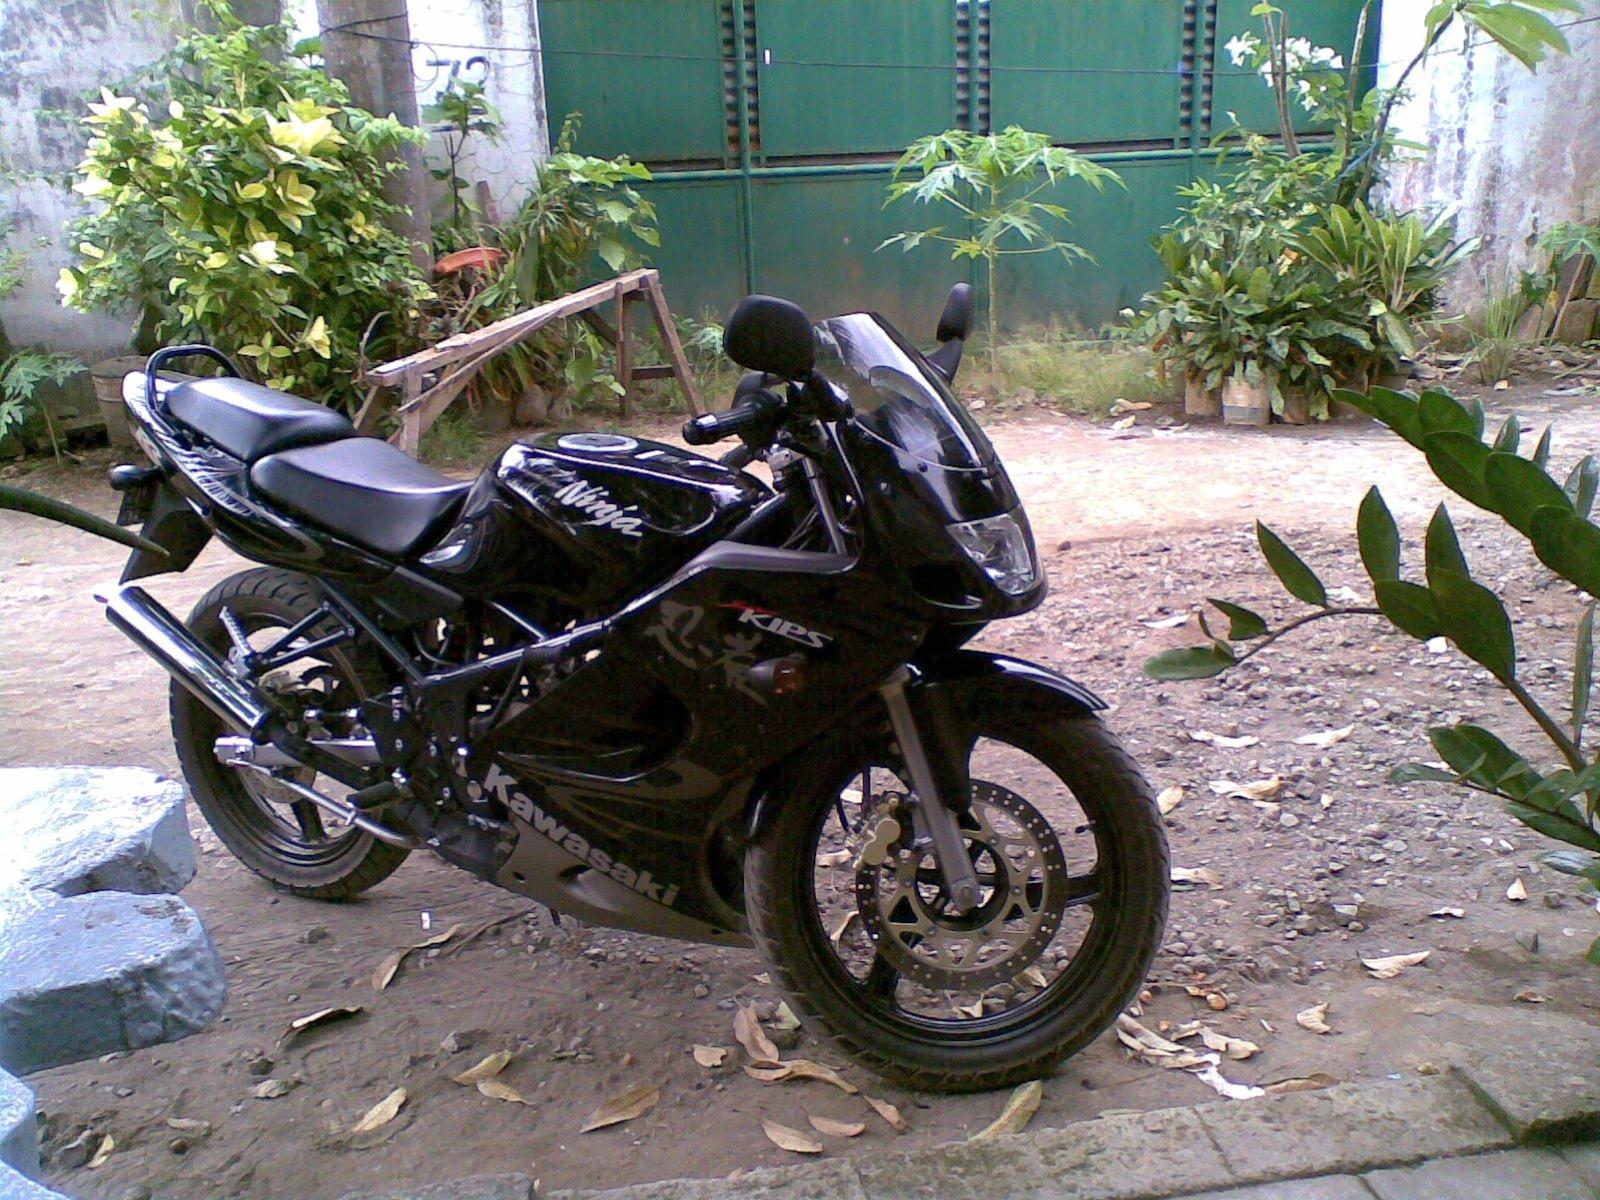 Modifikasi Yamaha New Vixion 2013 Modifikasi Motor /page/2